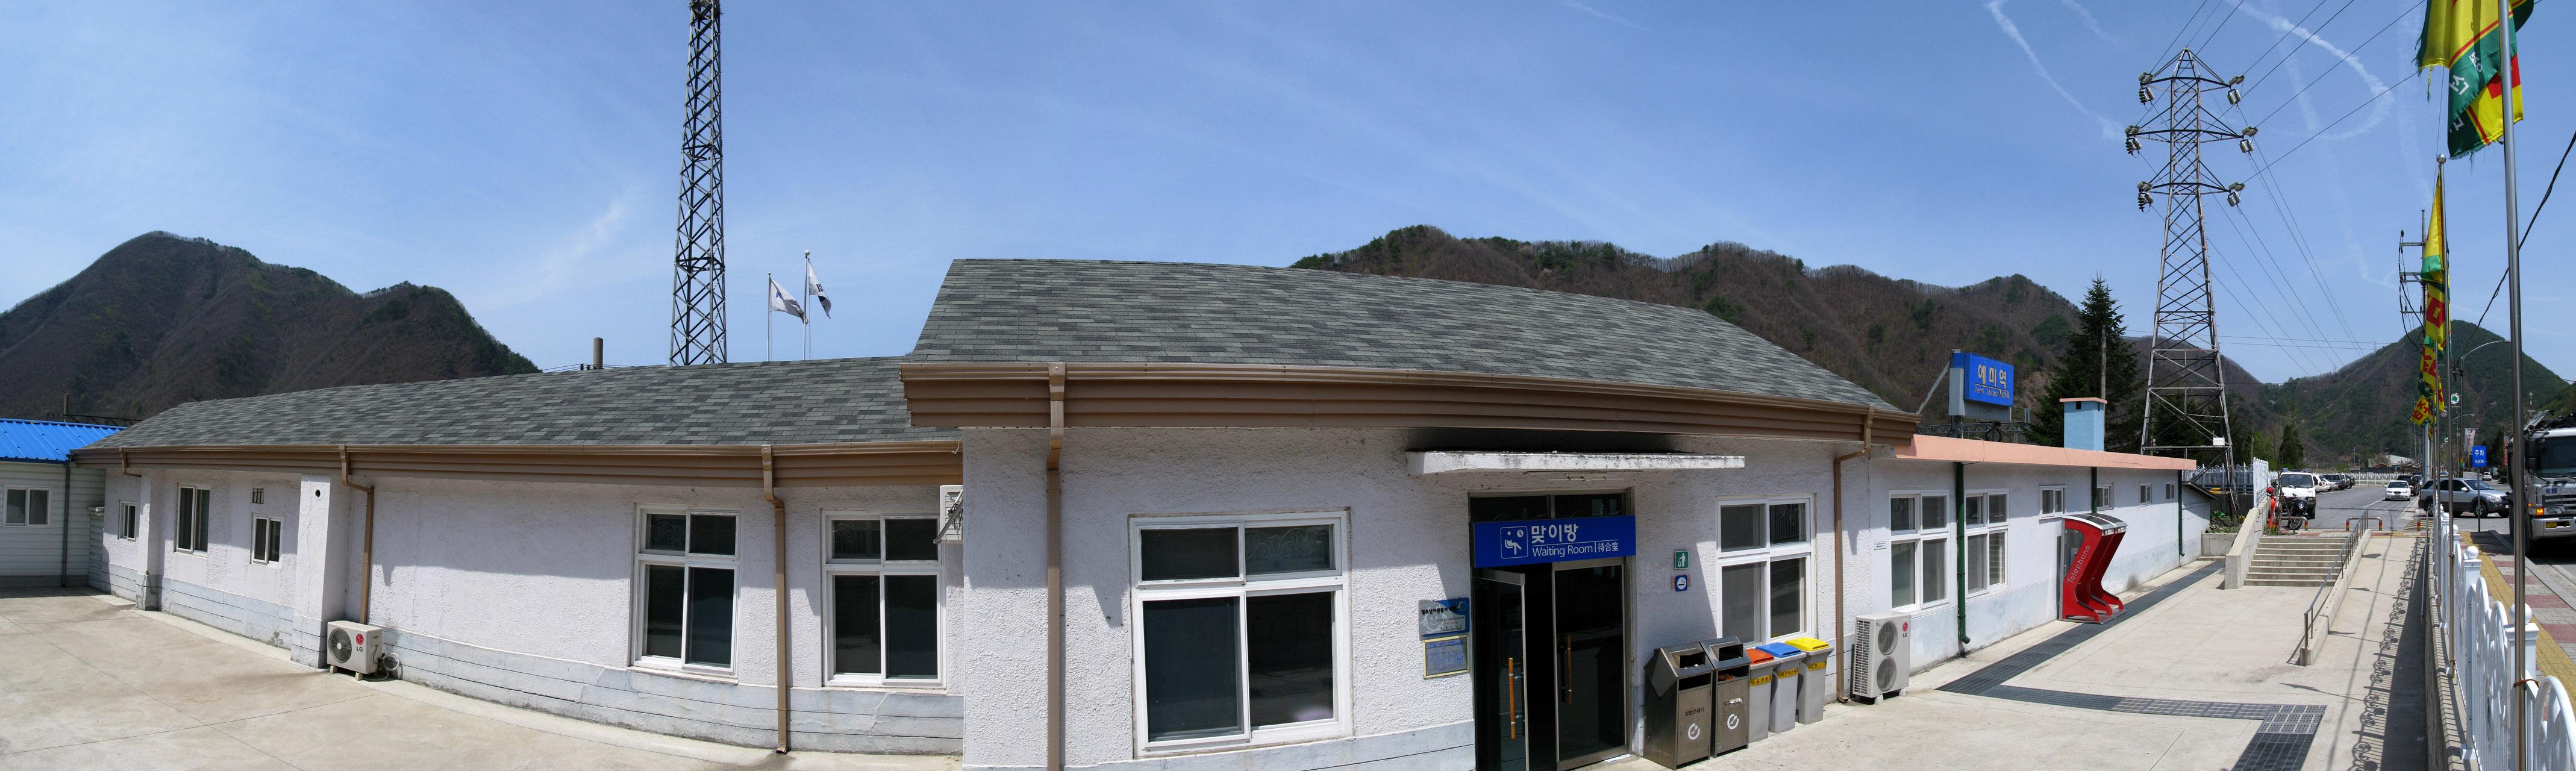 Korail Yemi Station Frontyard Panoramic.jpg